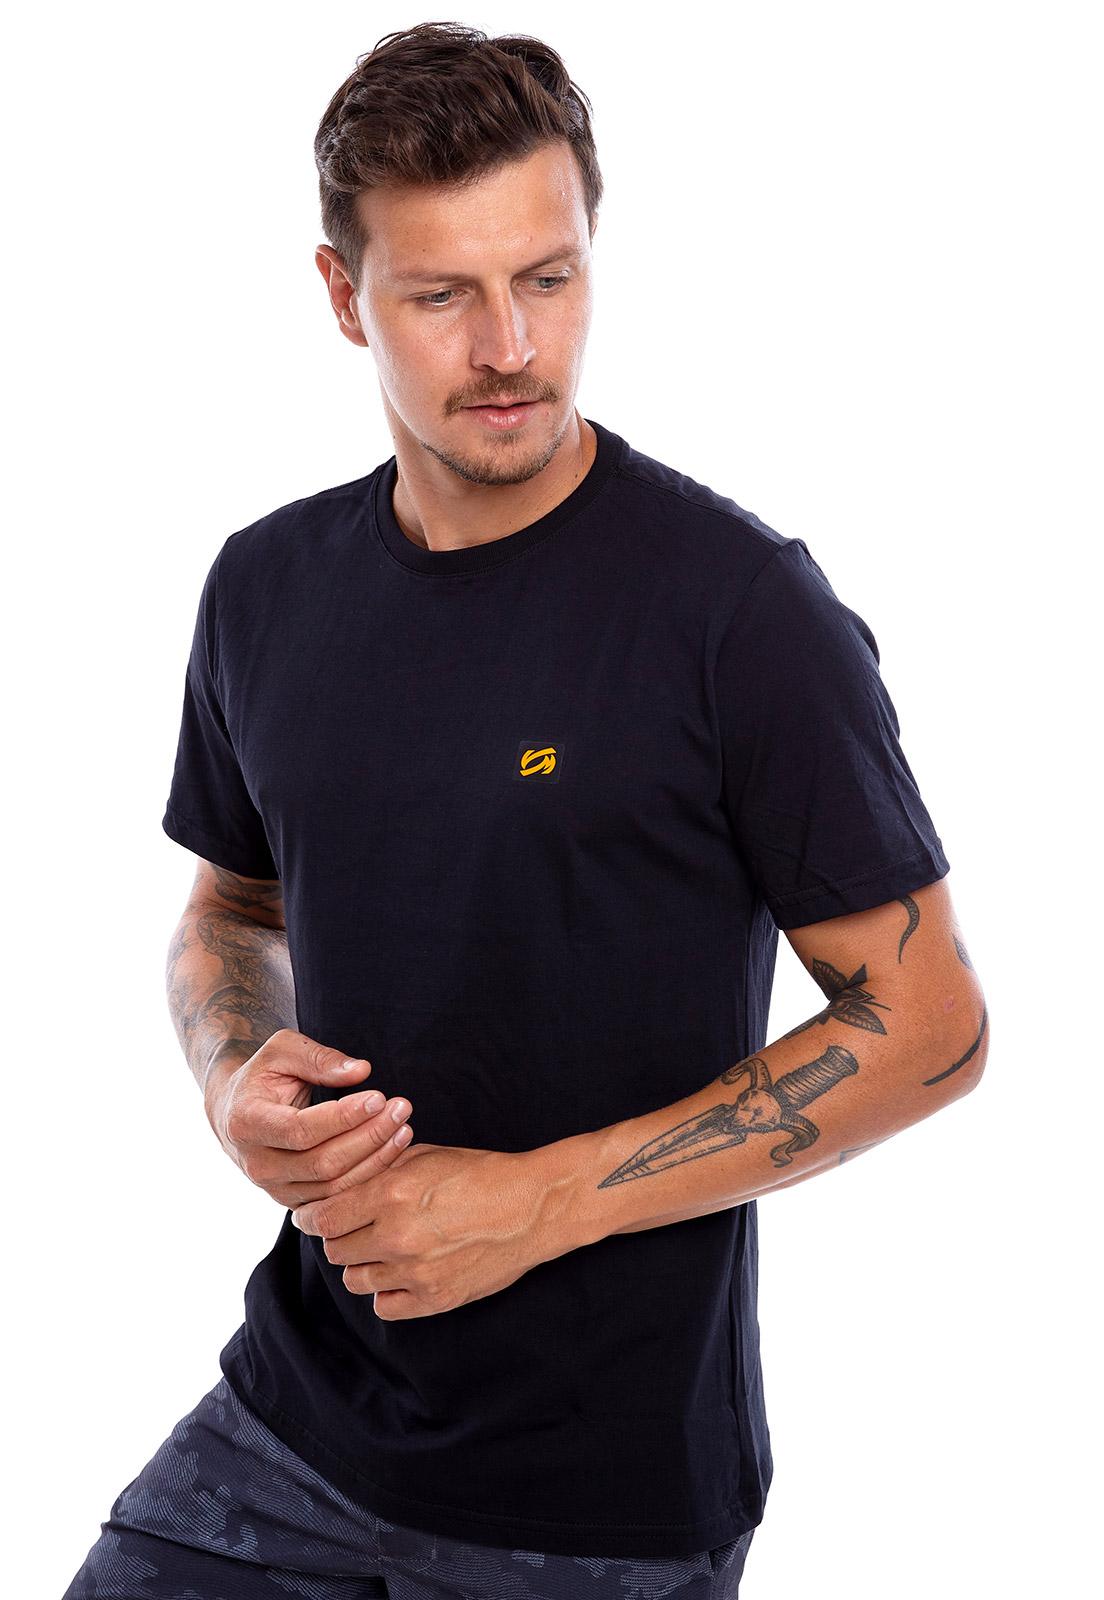 Camiseta Vida Marinha Manga Curta Preto